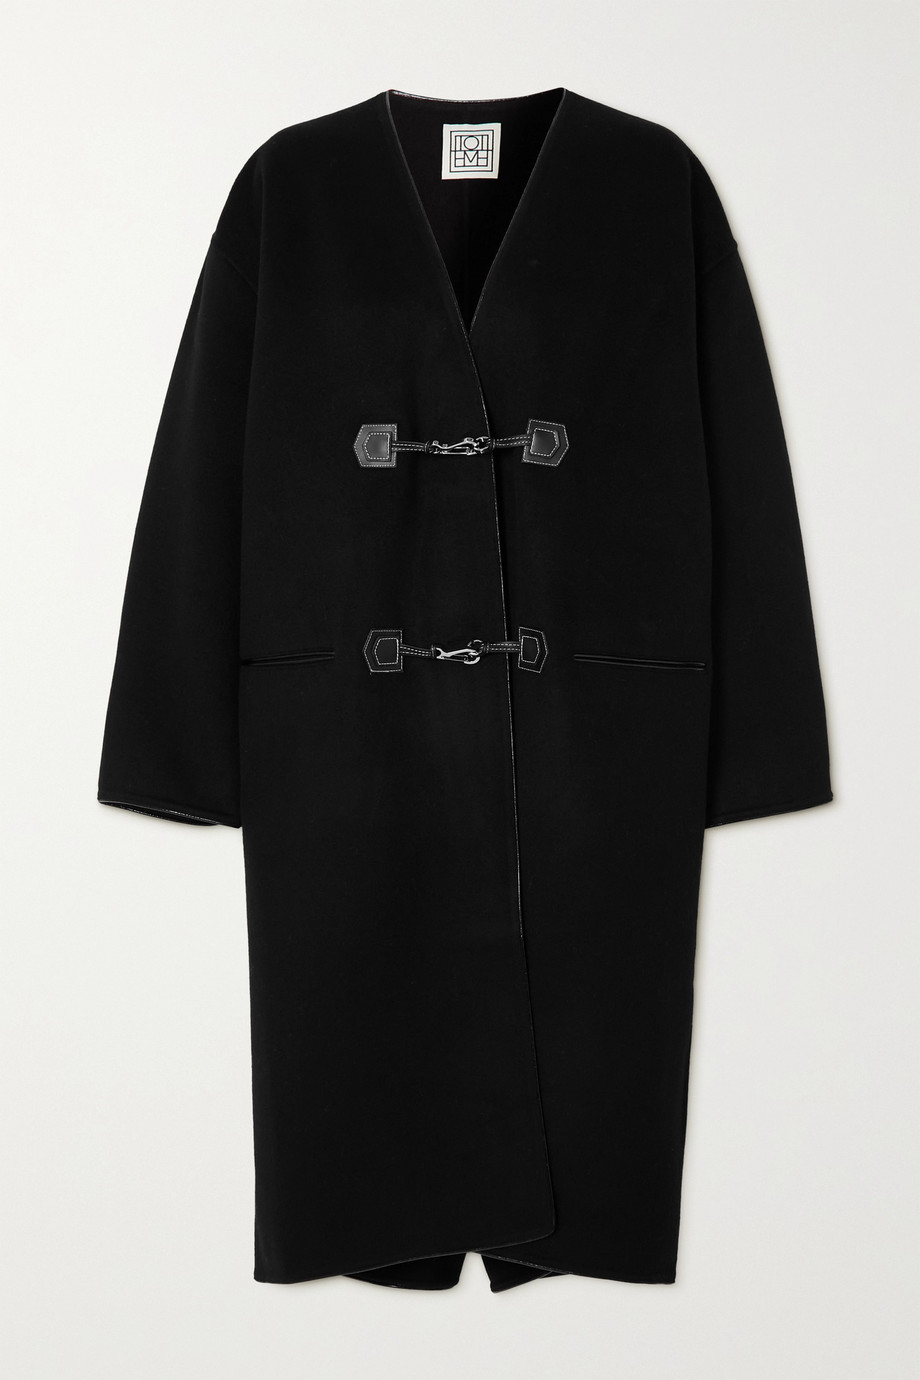 Totême Leather-trimmed brushed wool and cashmere-blend coat